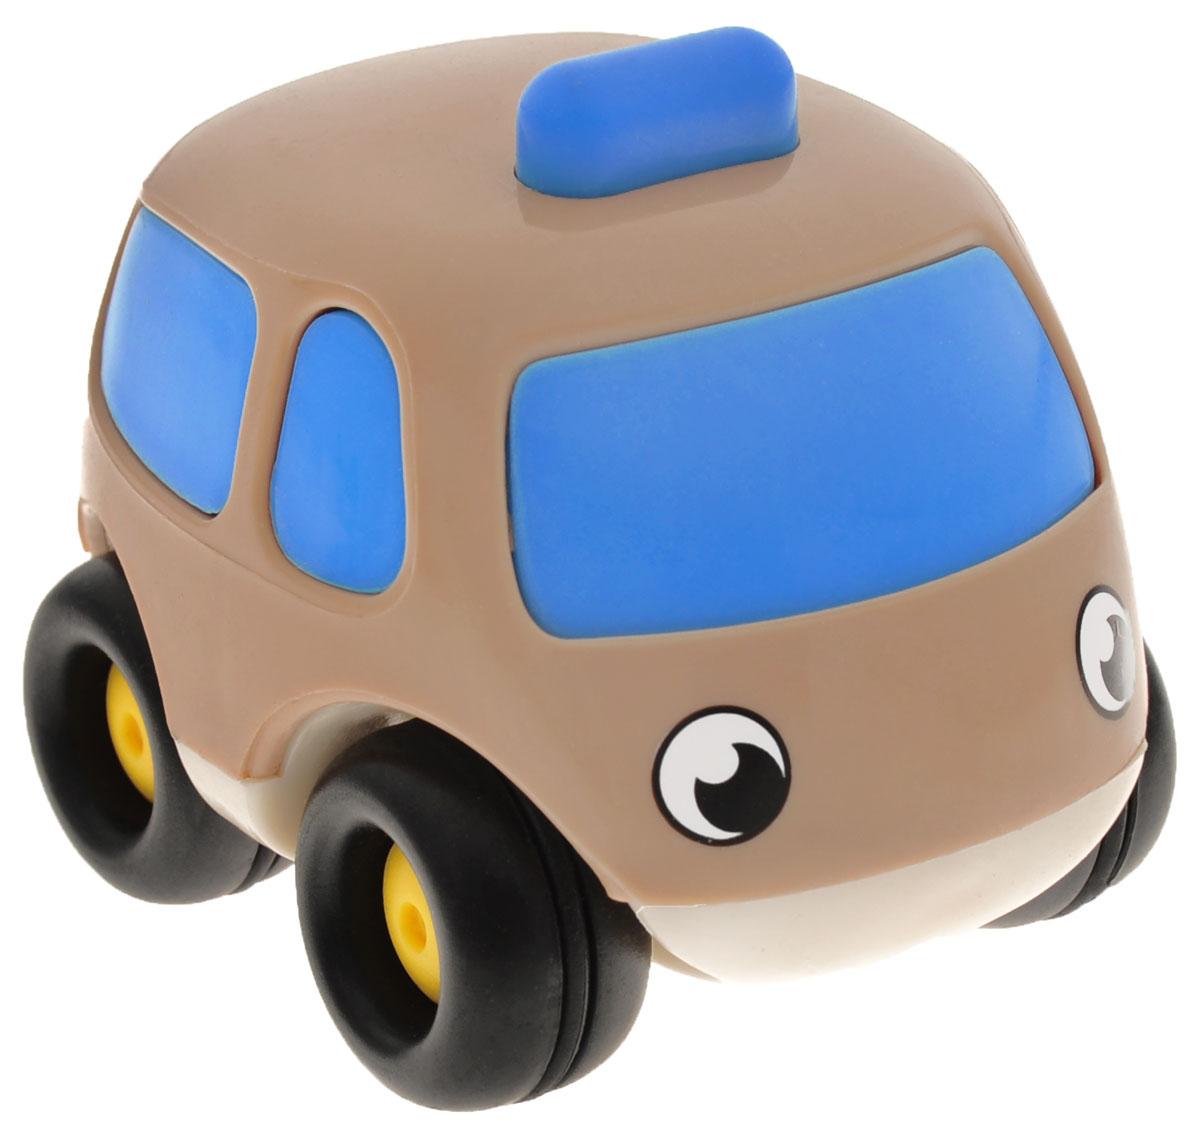 Smoby Мини-машинка Vroom Planet цвет коричневый голубой smoby машинка vroom planet цвет фиолетовый